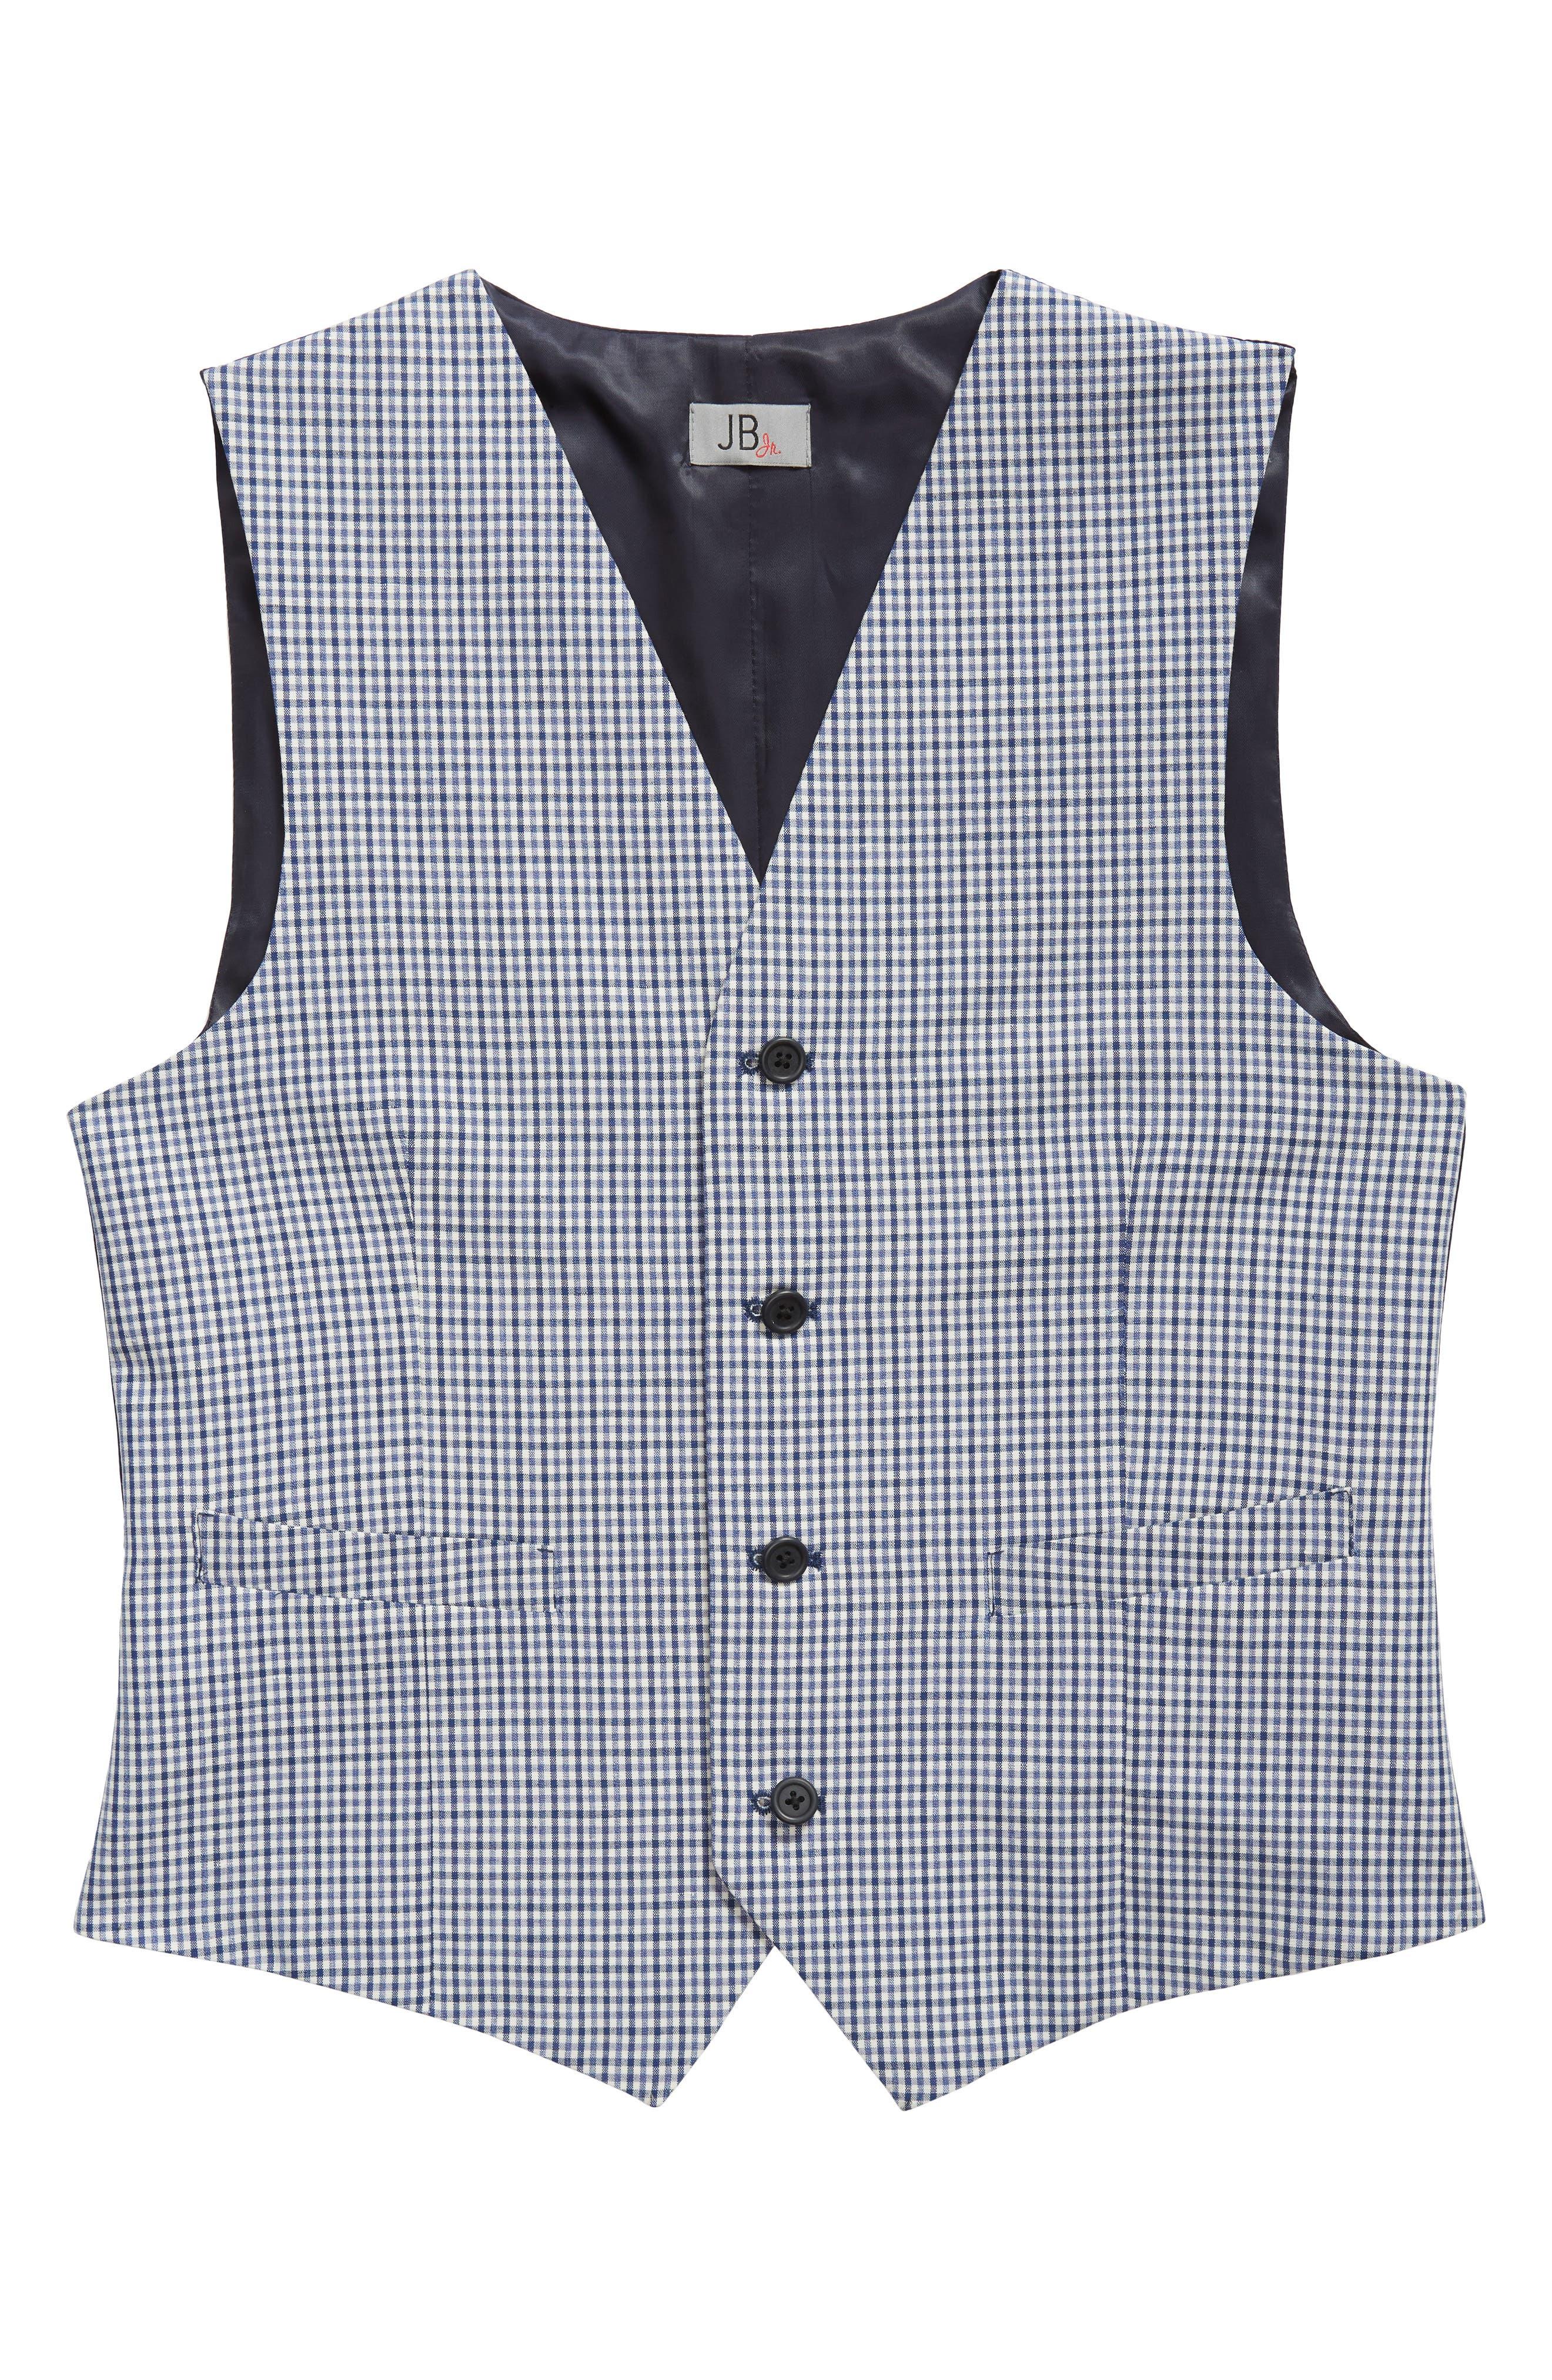 JB Jr. Check Wool Vest (Big Boys)